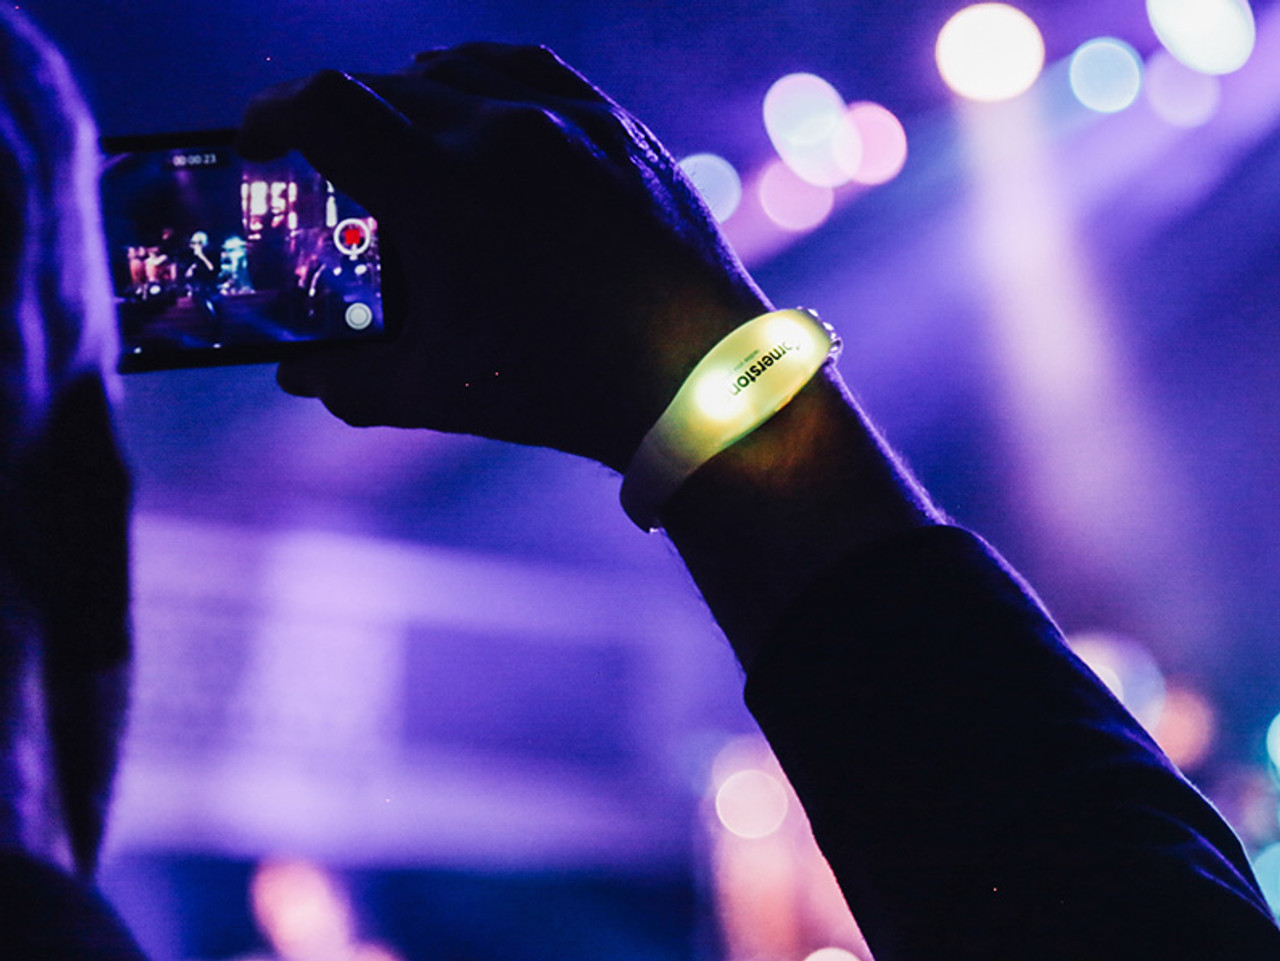 Crowdsync,Crowd sync, LEd, Wristband, RF, RFID, DMX, control, Wireless, Remote, Light up,